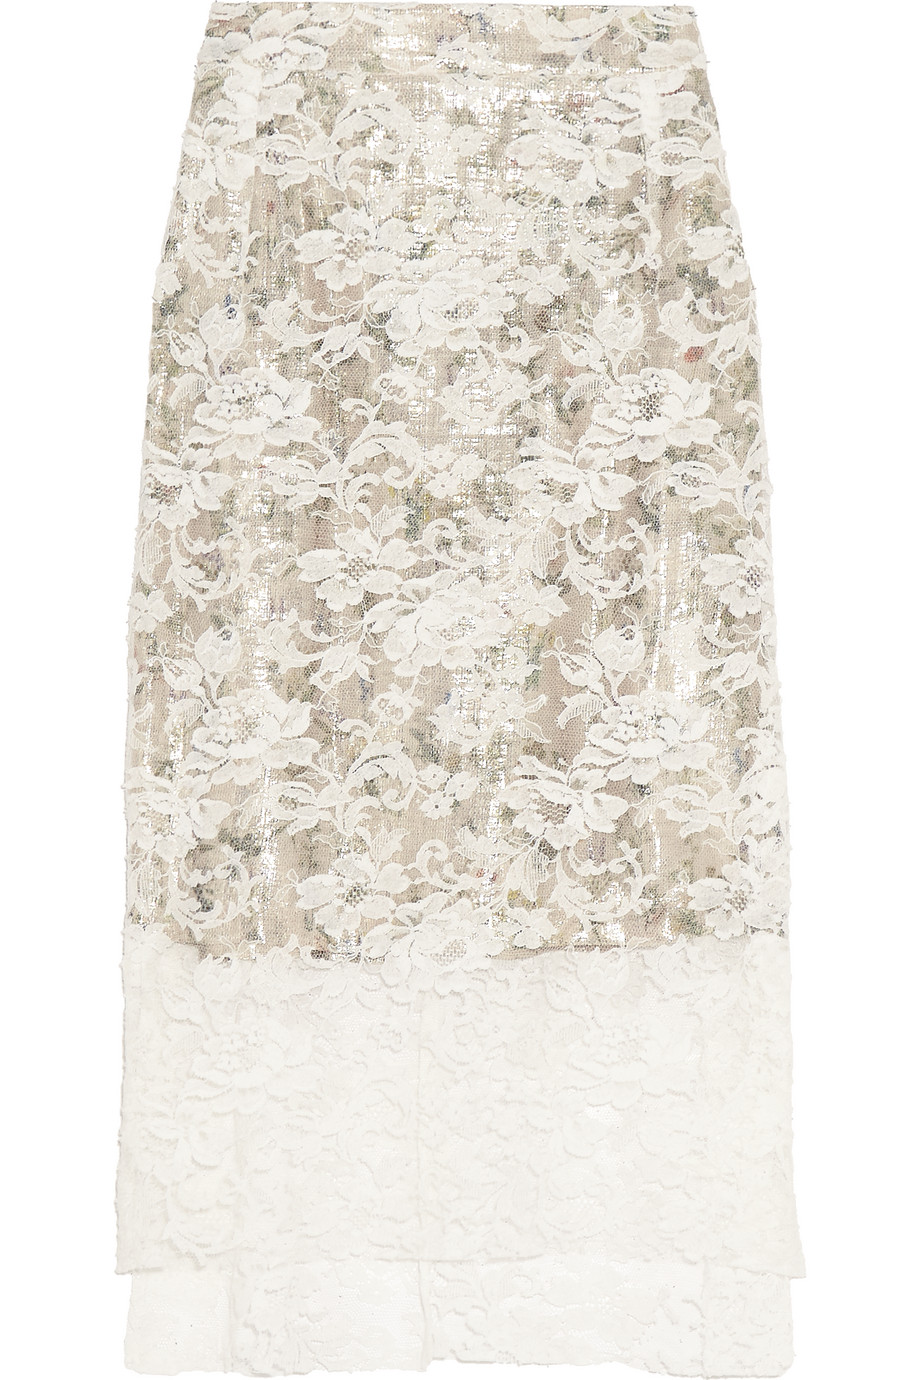 Lace Skirt, Preen by Thornton Bregazzi, Ivory, Women's